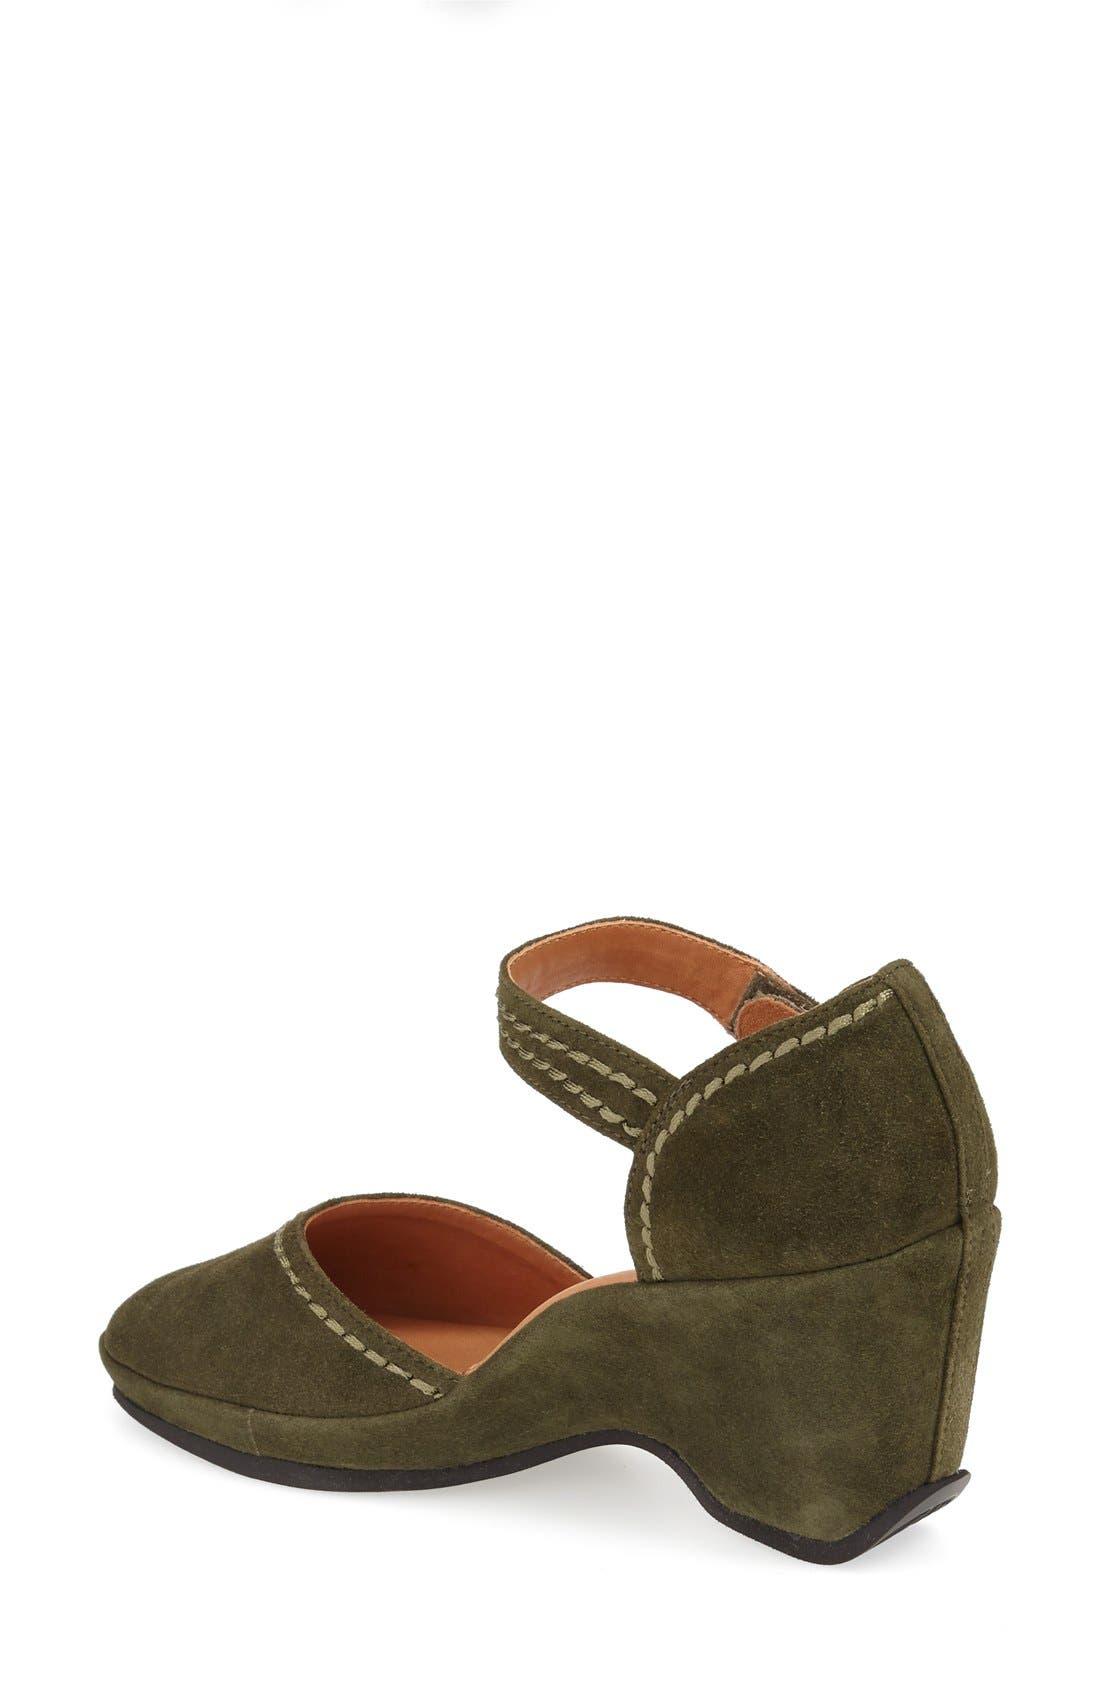 Alternate Image 2  - L'Amourdes Pieds'Orva' Wedge Sandal (Women)